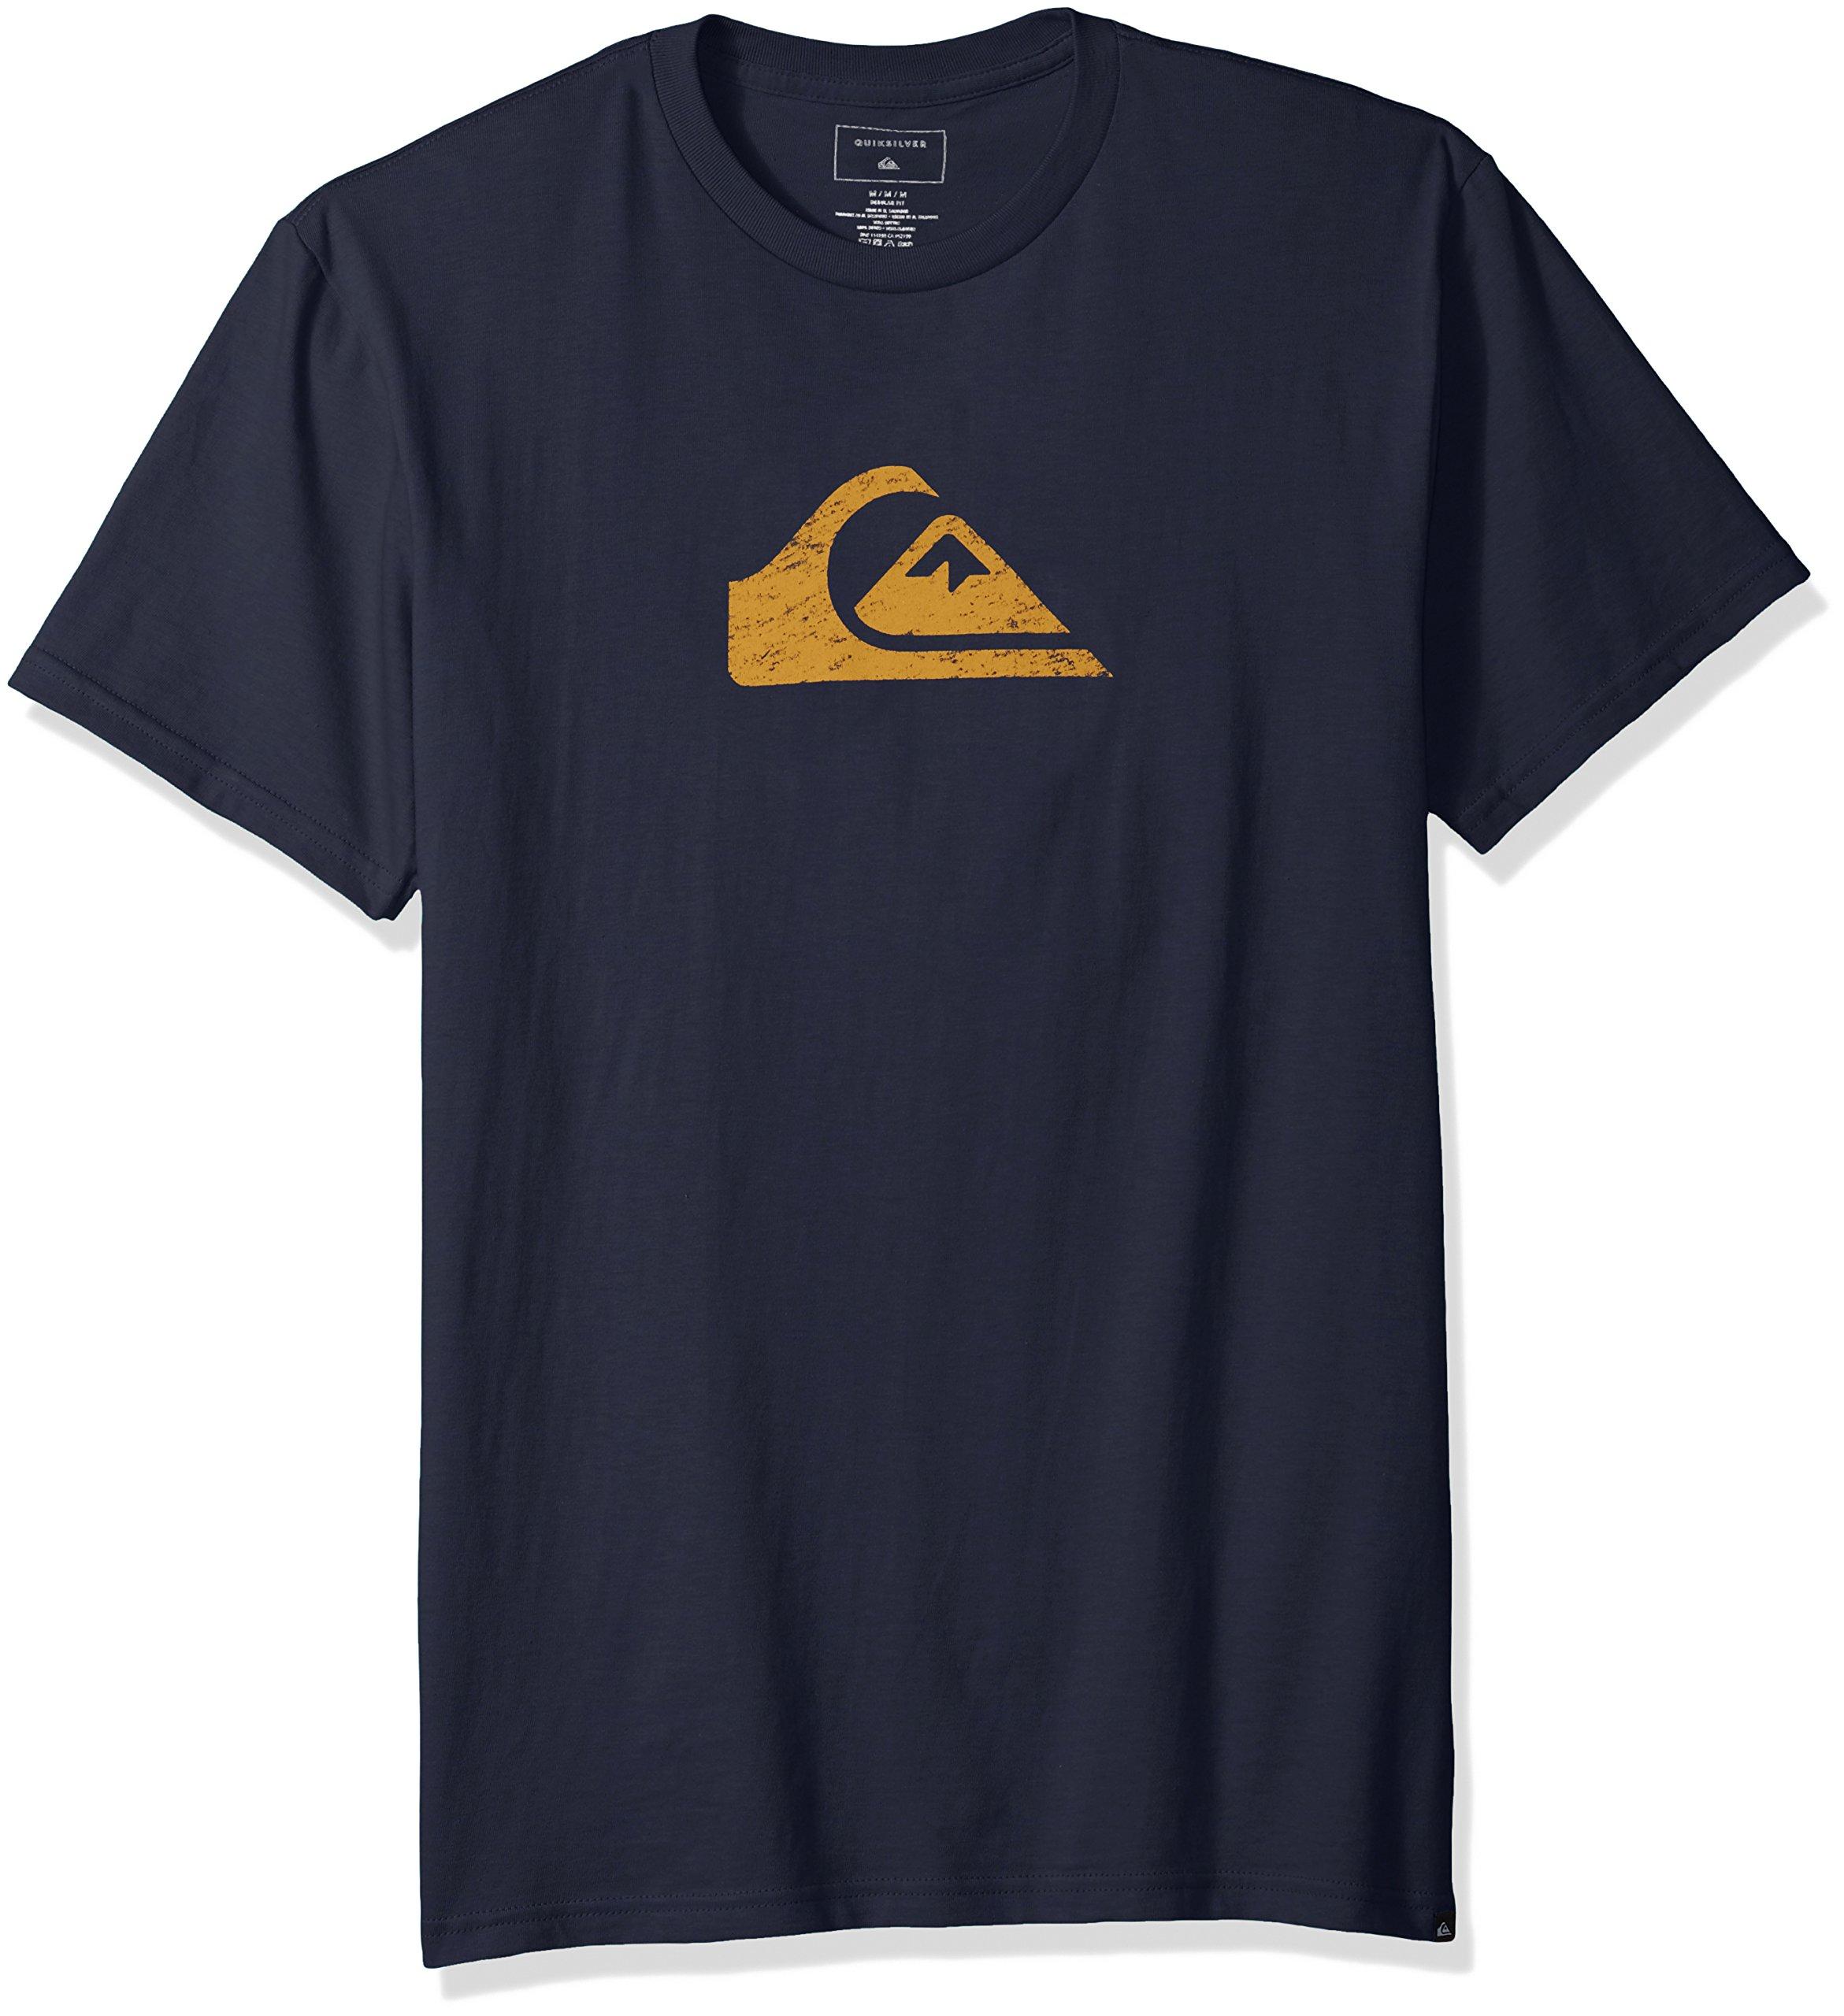 Quiksilver Men's Comp Logo Tee Shirt, Blue Nights, S